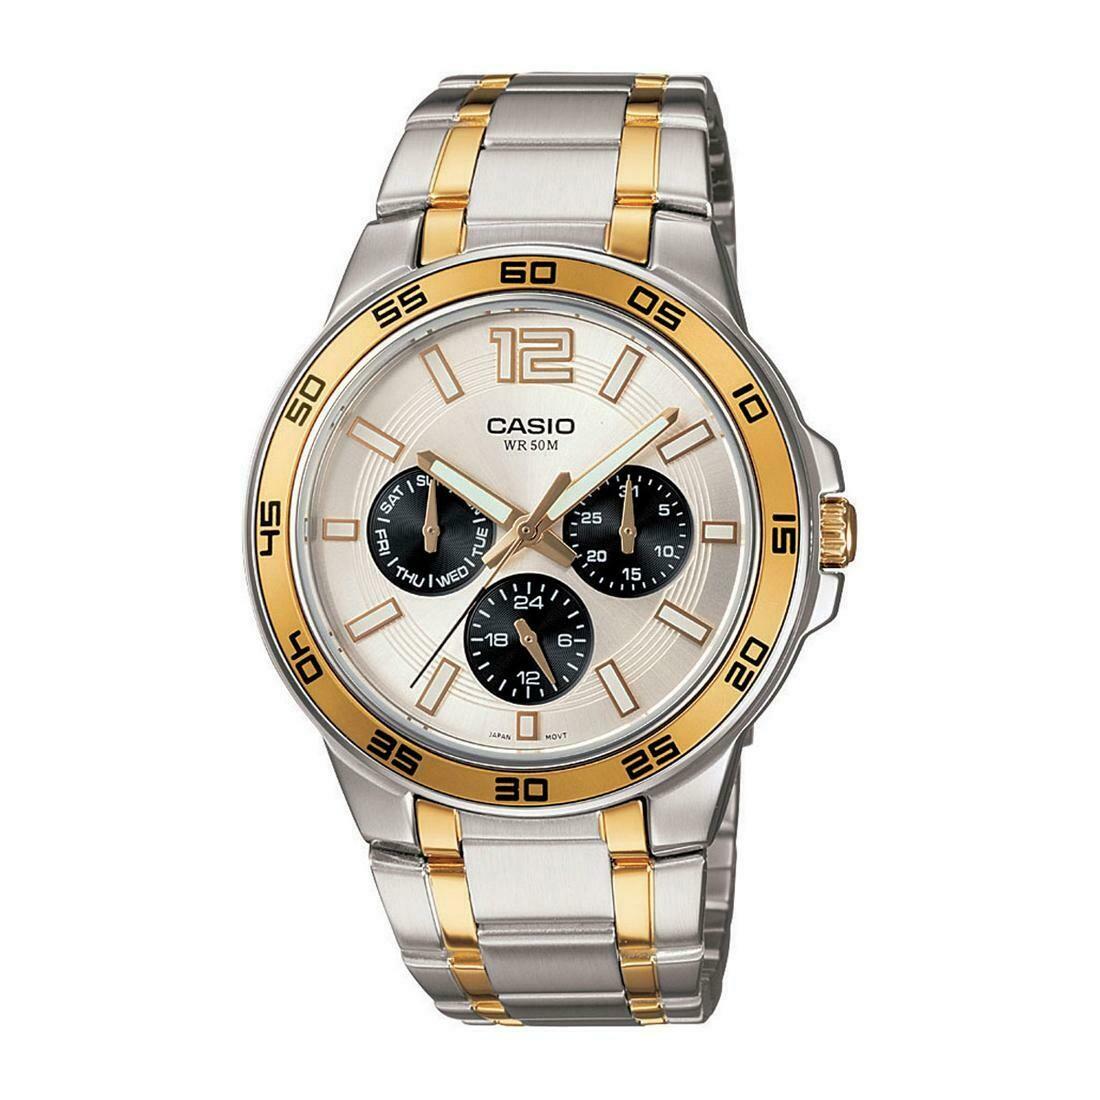 Casio Enticer MTP-1300SG-7AVDF Analog Wrist Watch For Men